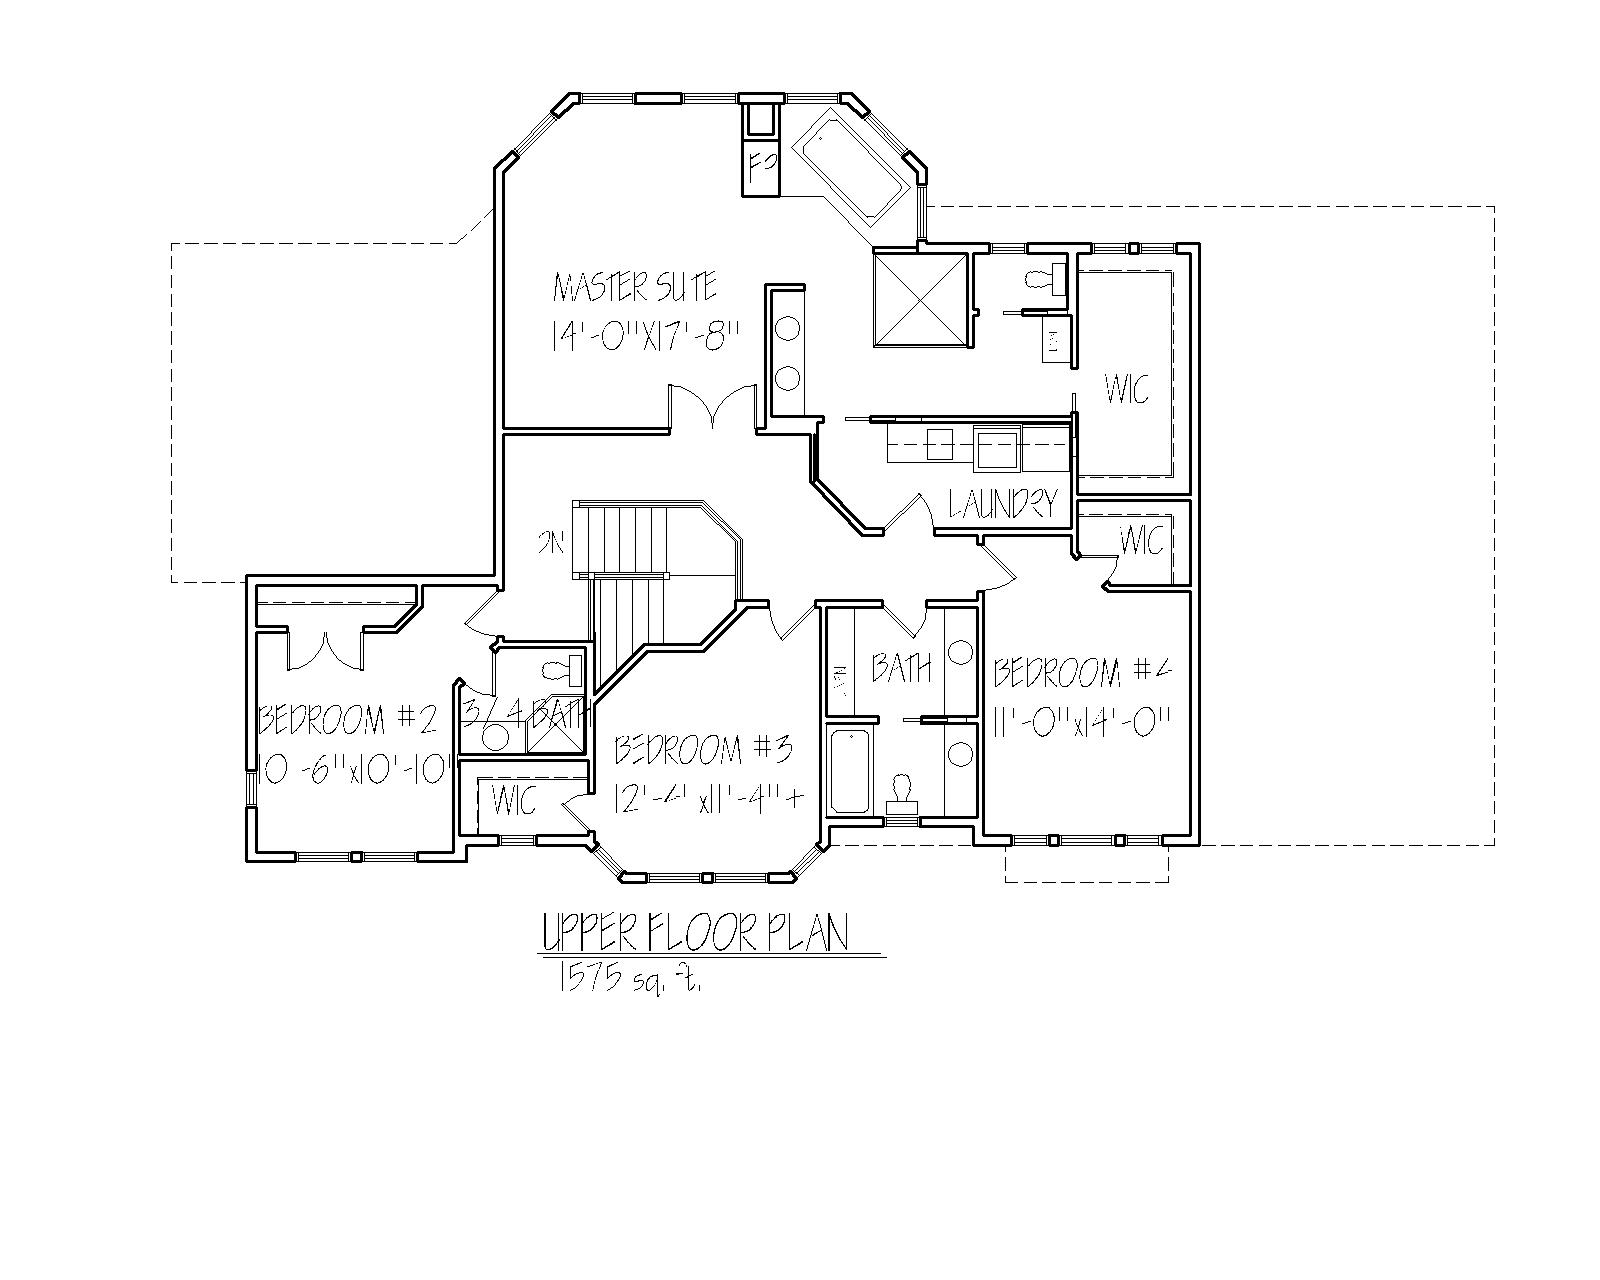 Mackenzie Upper Floorplan